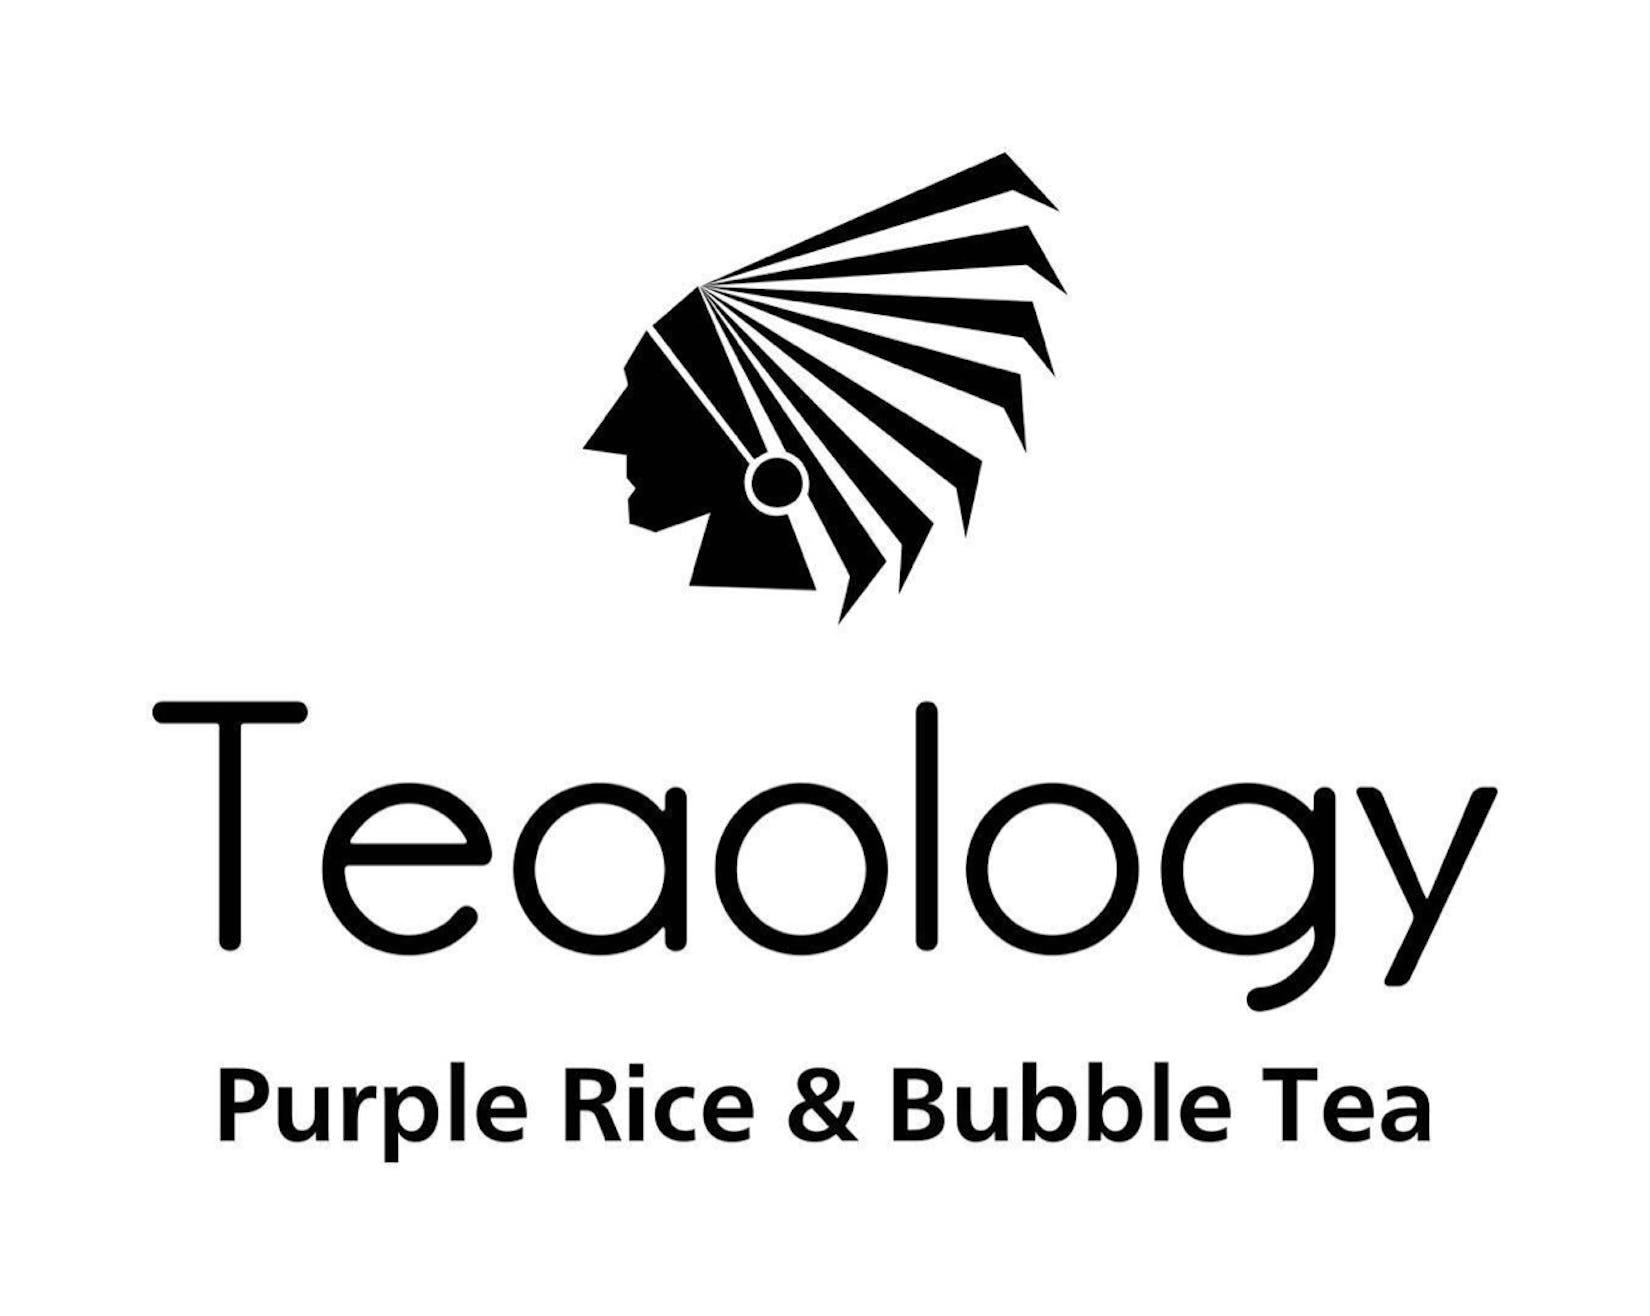 Teaology Purple Rice & Bubble Tea | yathar